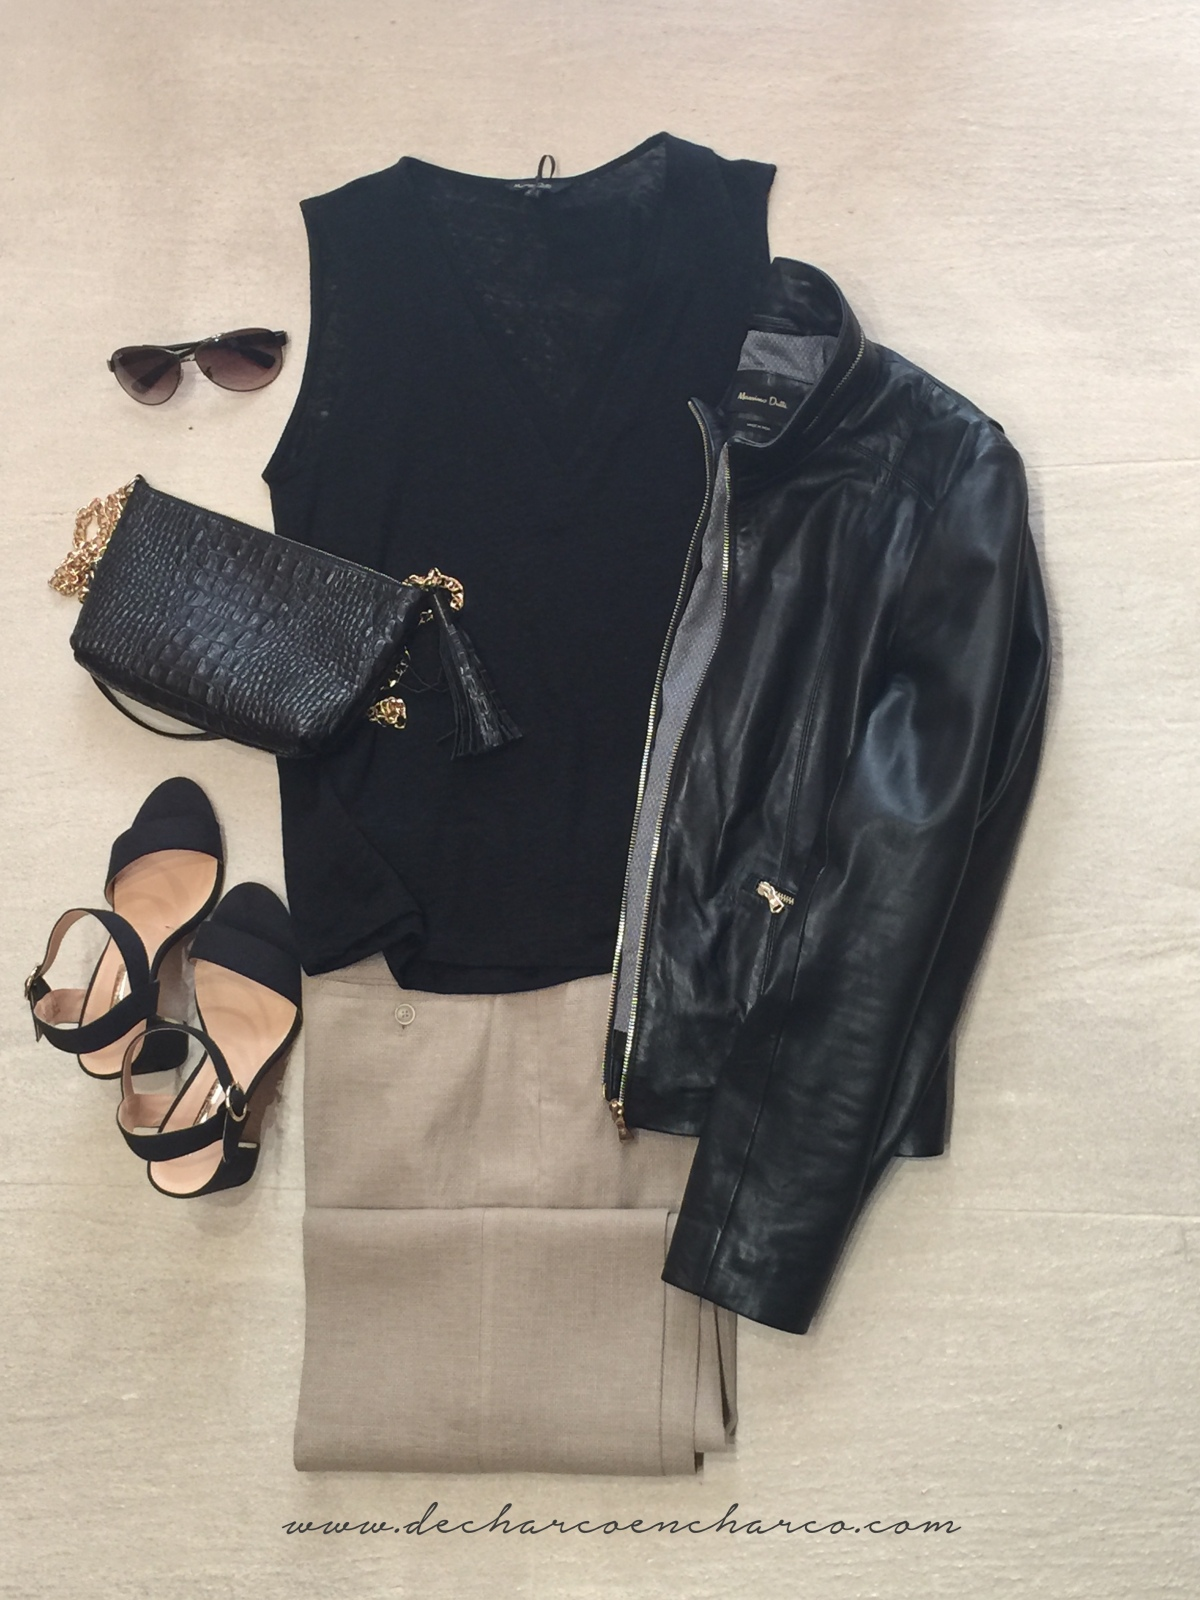 pantalones palazzo beiges conjunto negro www.decharcoencharco.com